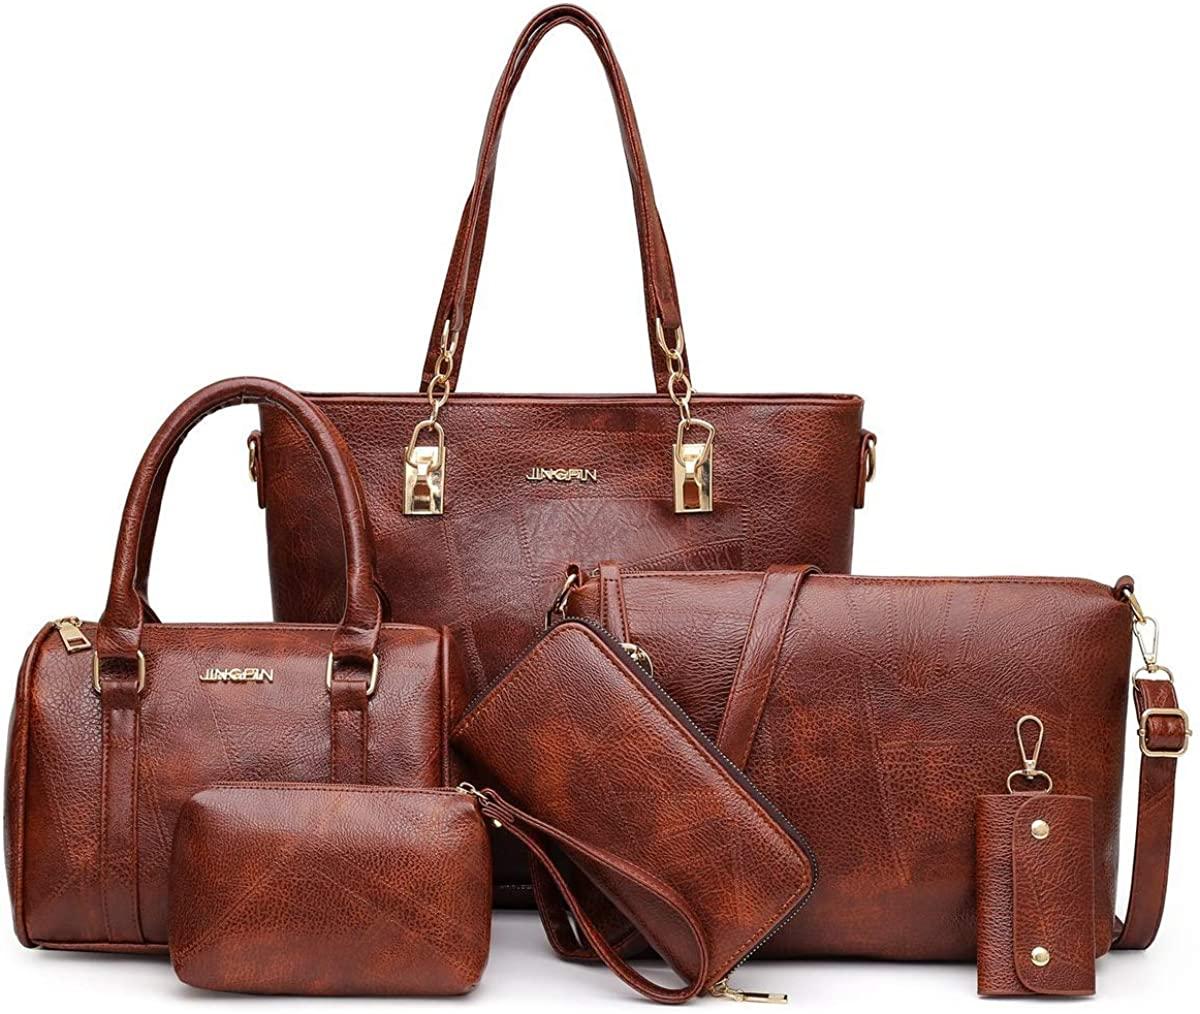 Designer Purses and Handbags for Women Satchel Shoulder Bag Tote Top Handle Bag